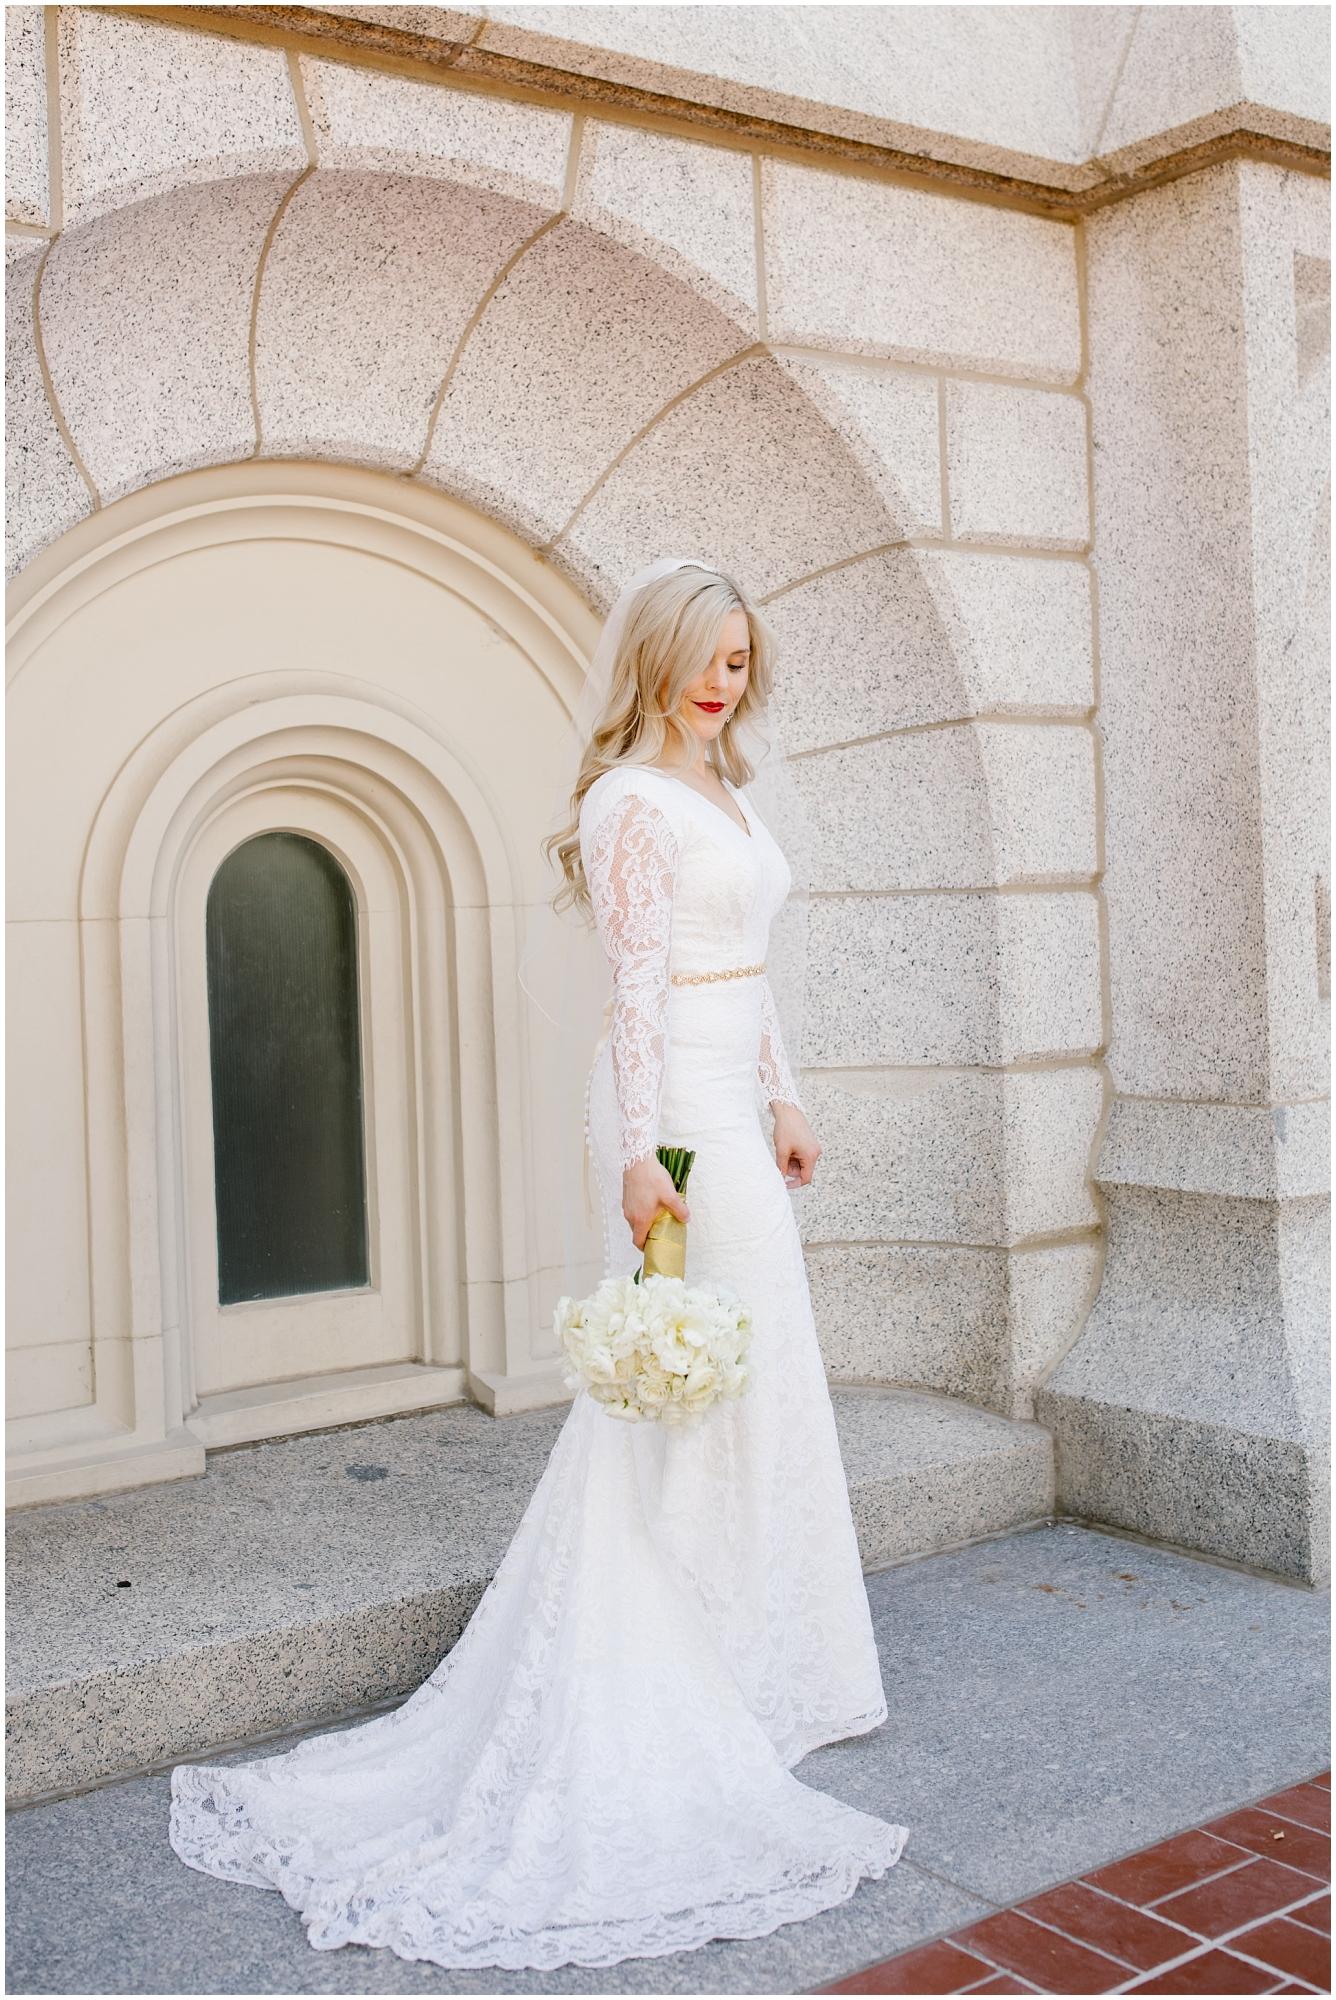 CherylandTyler-171_Lizzie-B-Imagery-Utah-Wedding-Photographer-Park-City-Salt-Lake-City-Temple-Wells-Fargo-Building.jpg